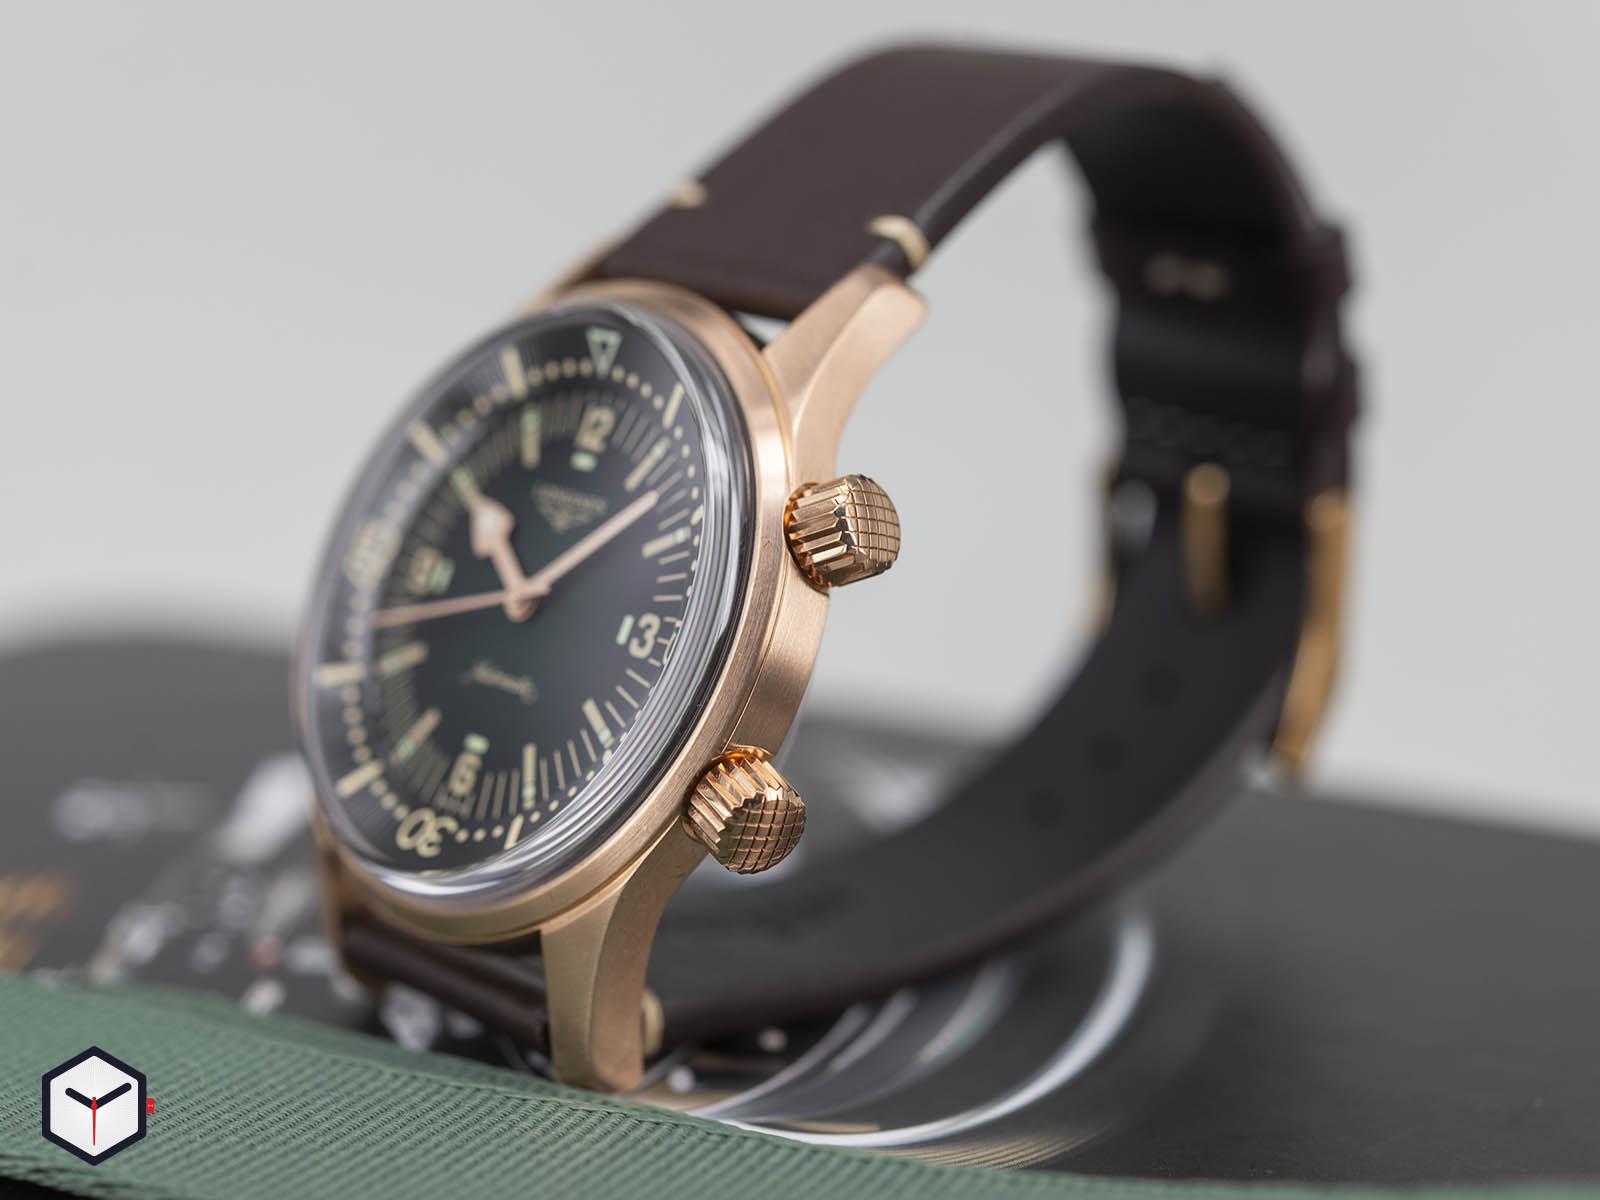 l3-774-1-50-2-longines-legend-diver-bronze-3.jpg